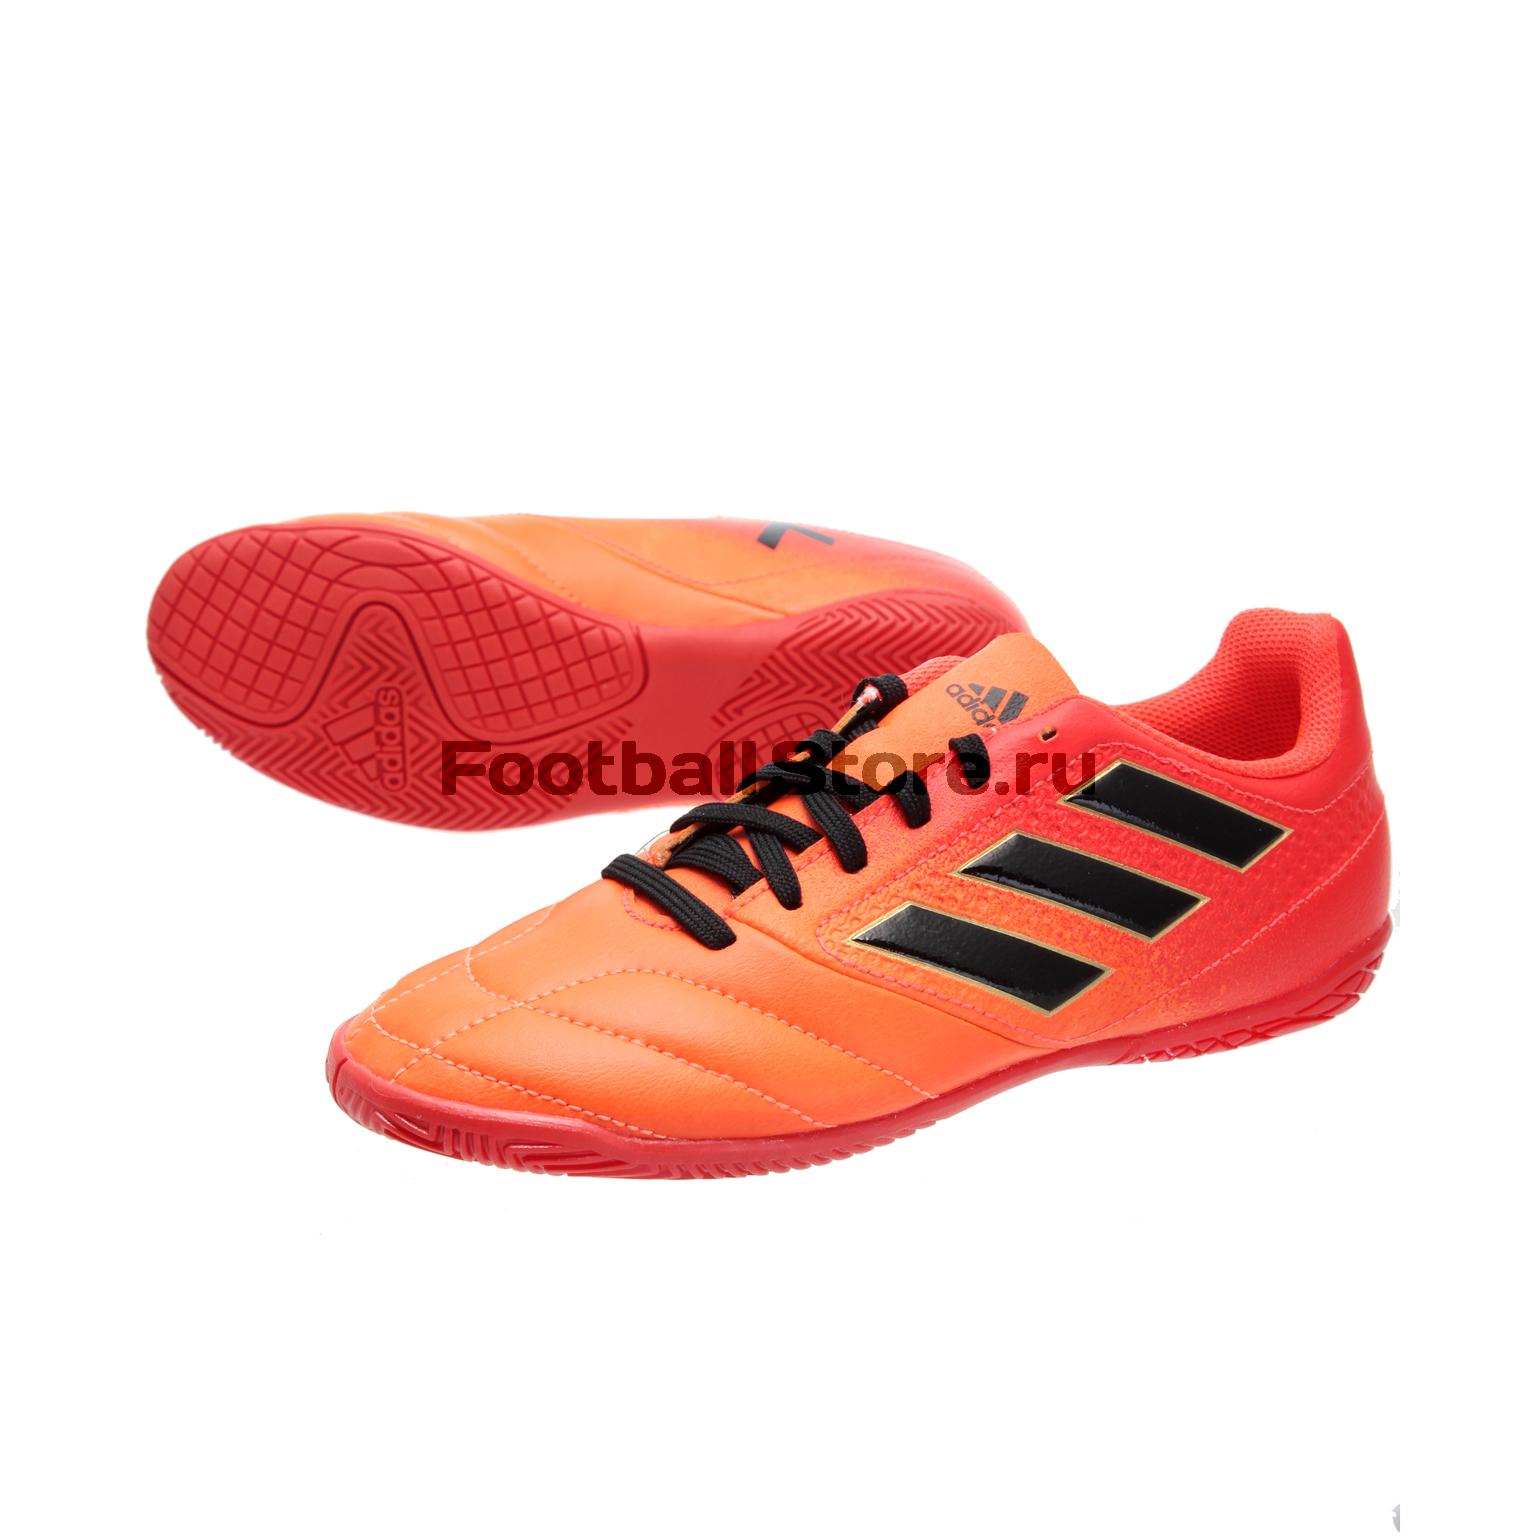 Фото Обувь для зала Adidas Ace 17.4 IN JR S77107